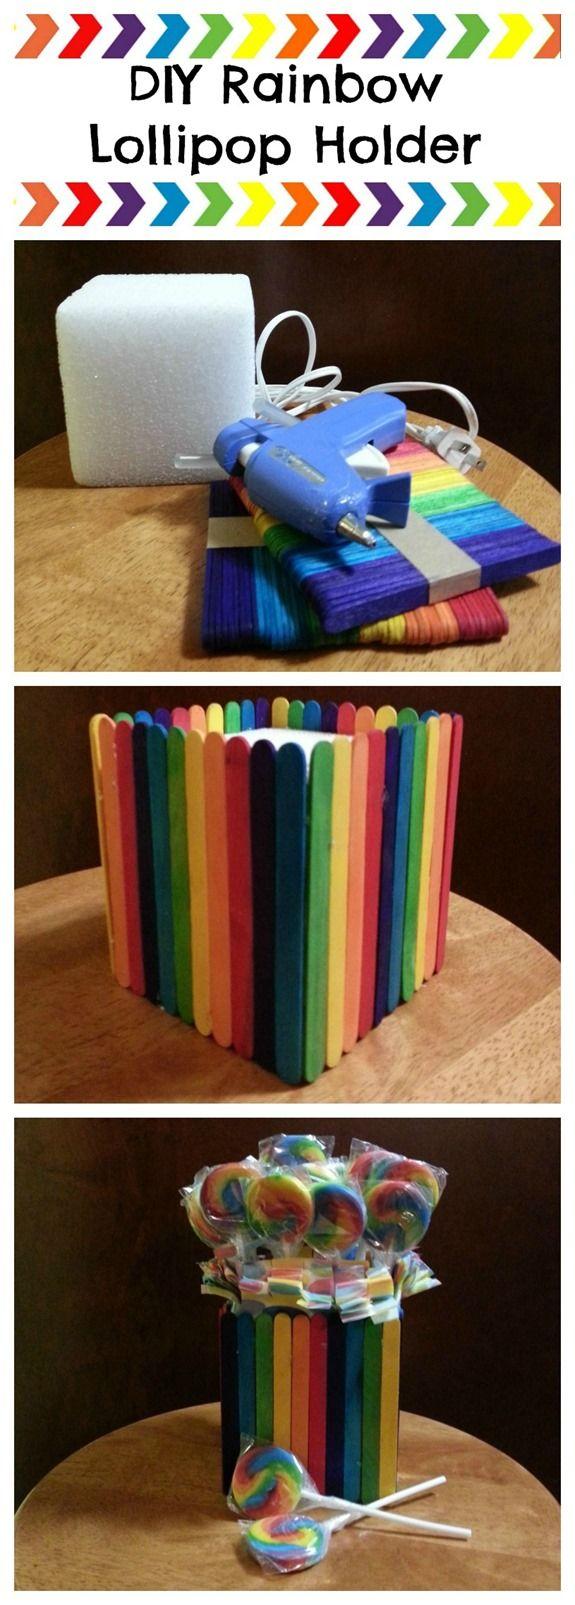 DIY Rainbow Lollipop Holder